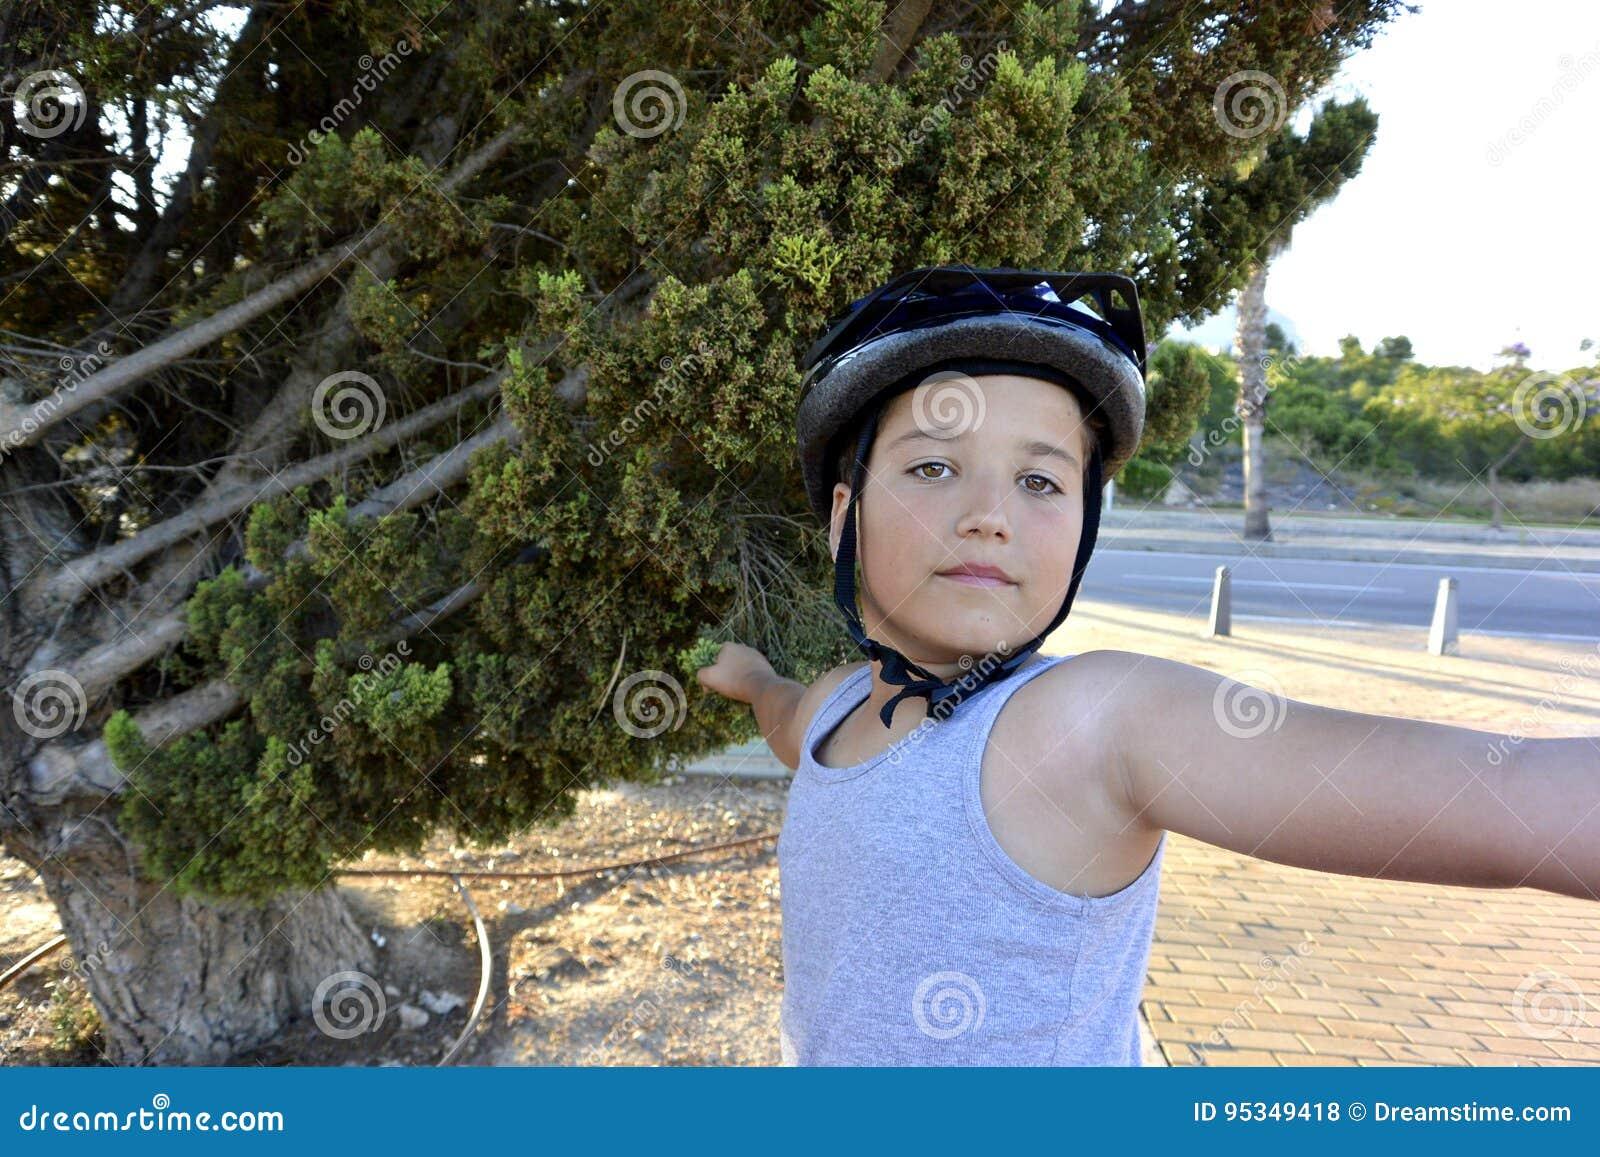 Мальчик на Monowheel